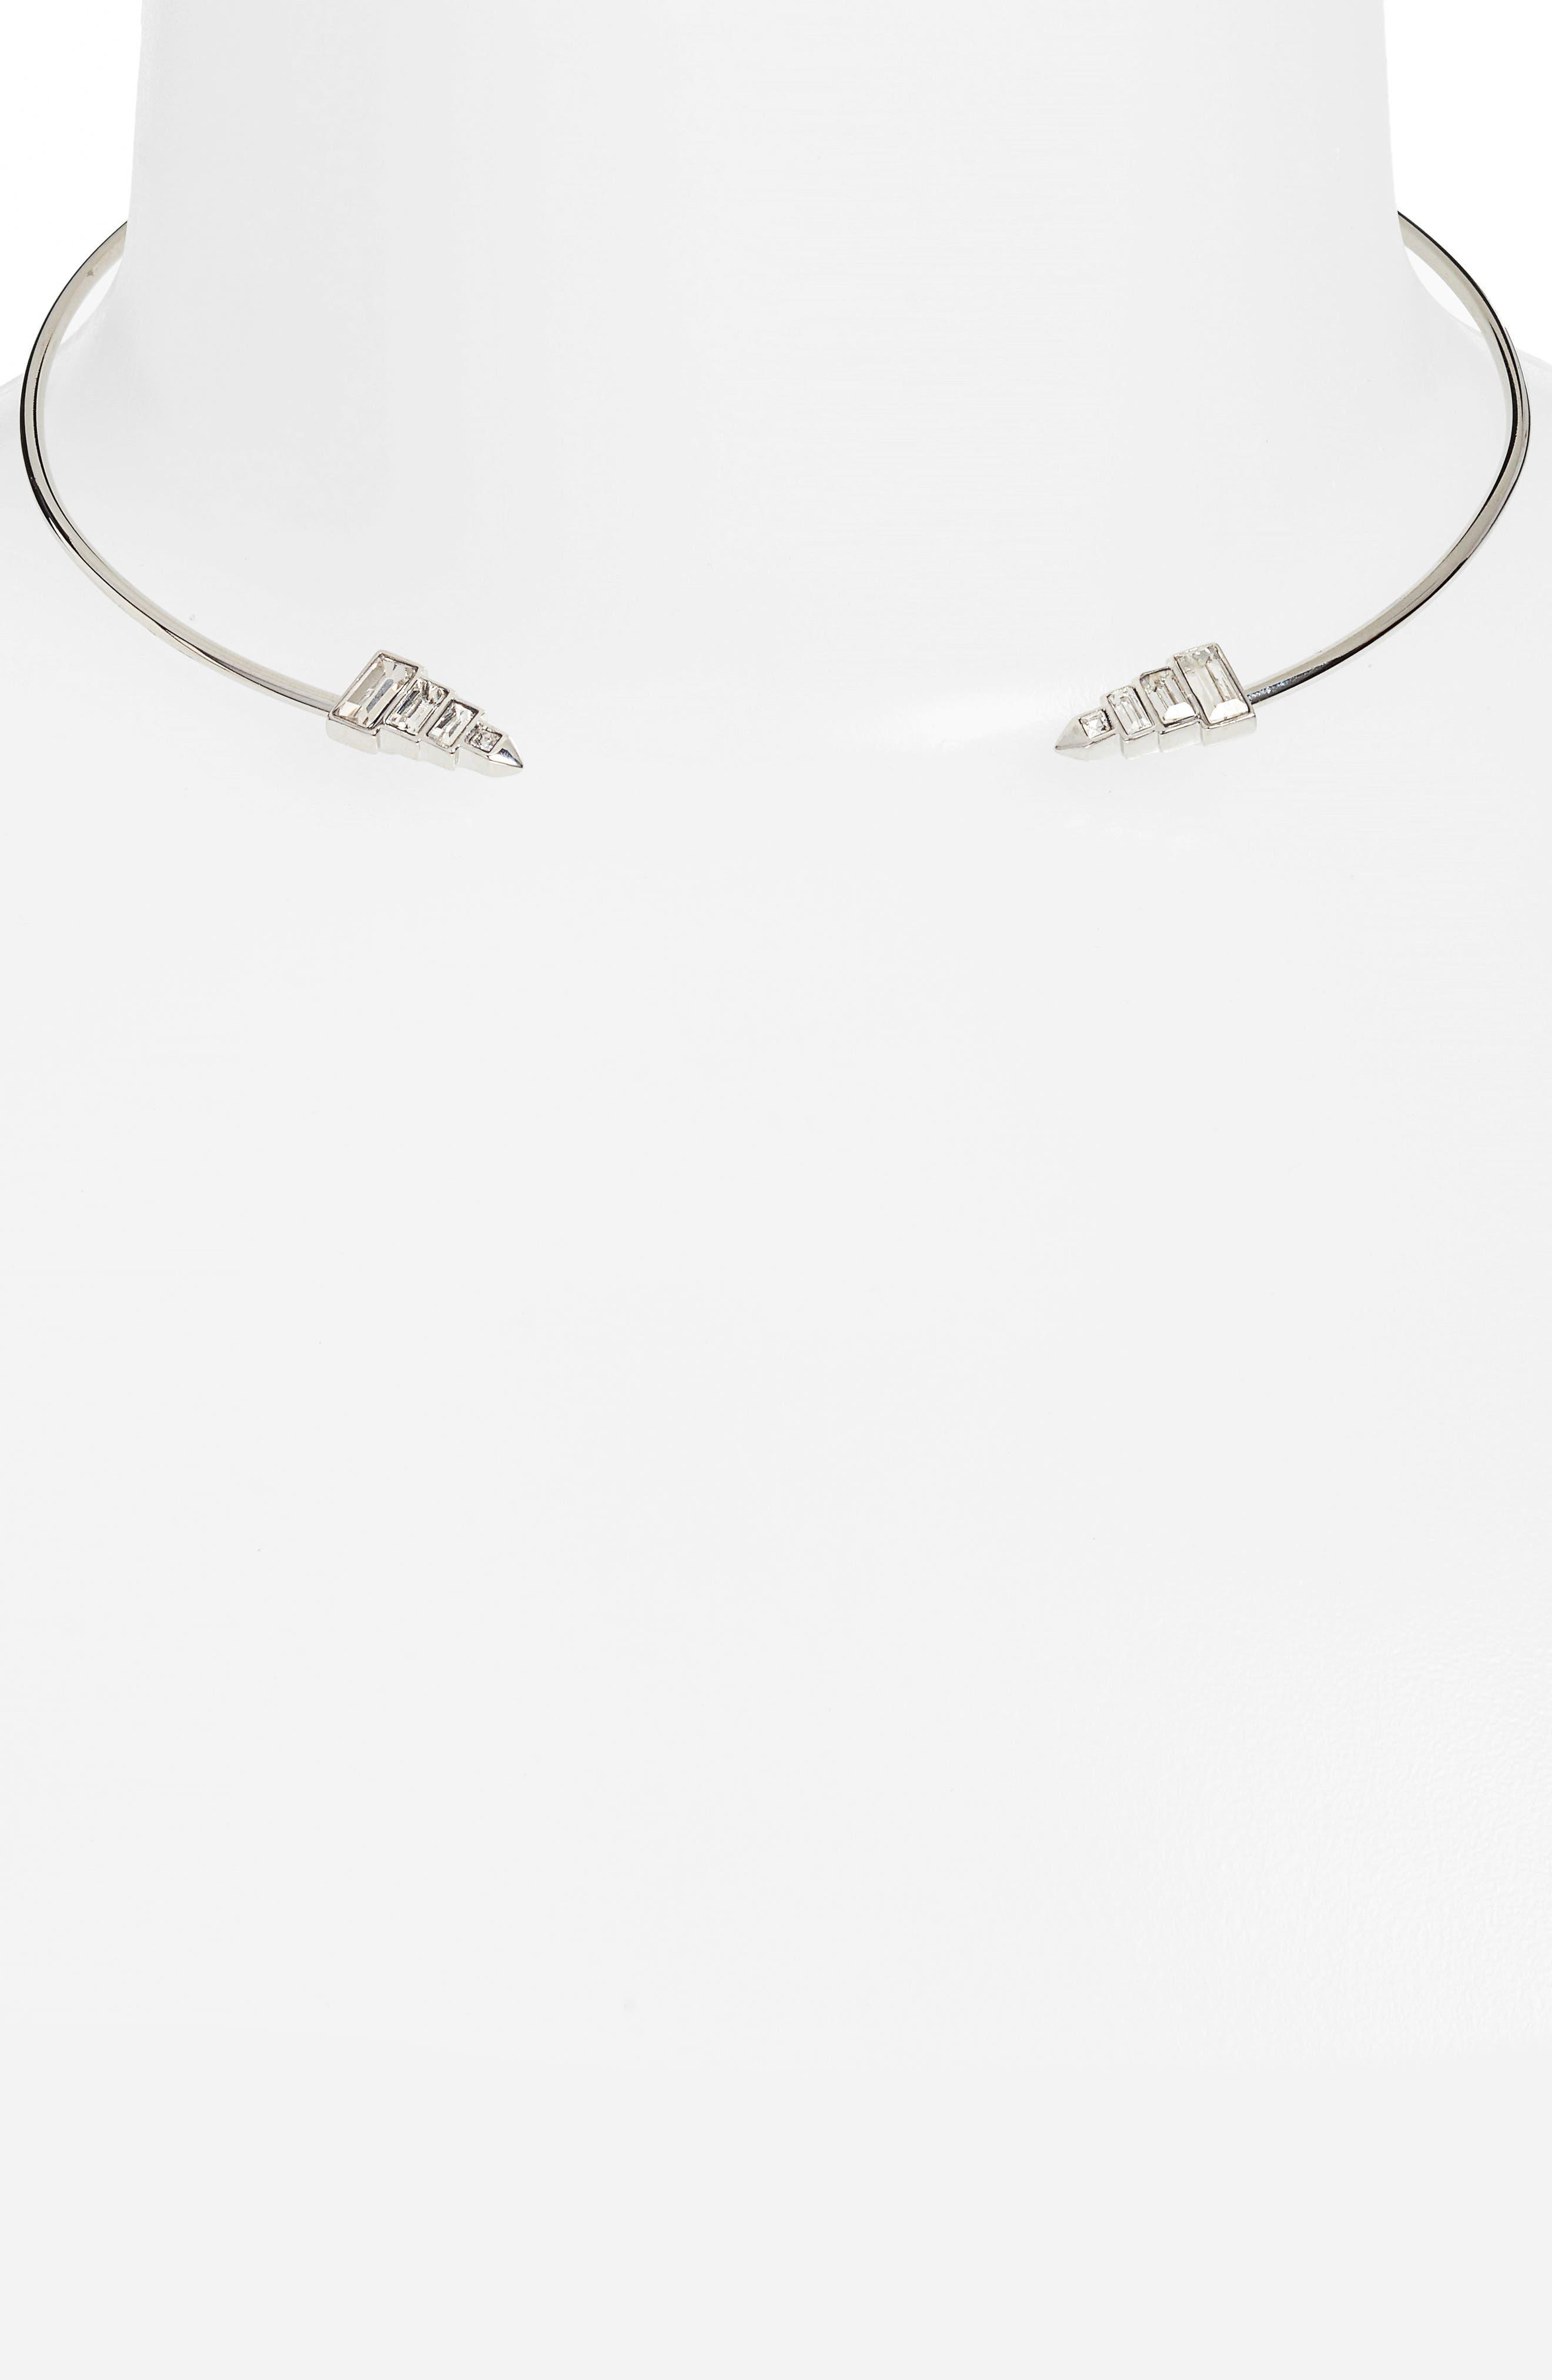 Open Collar Necklace,                             Alternate thumbnail 2, color,                             040